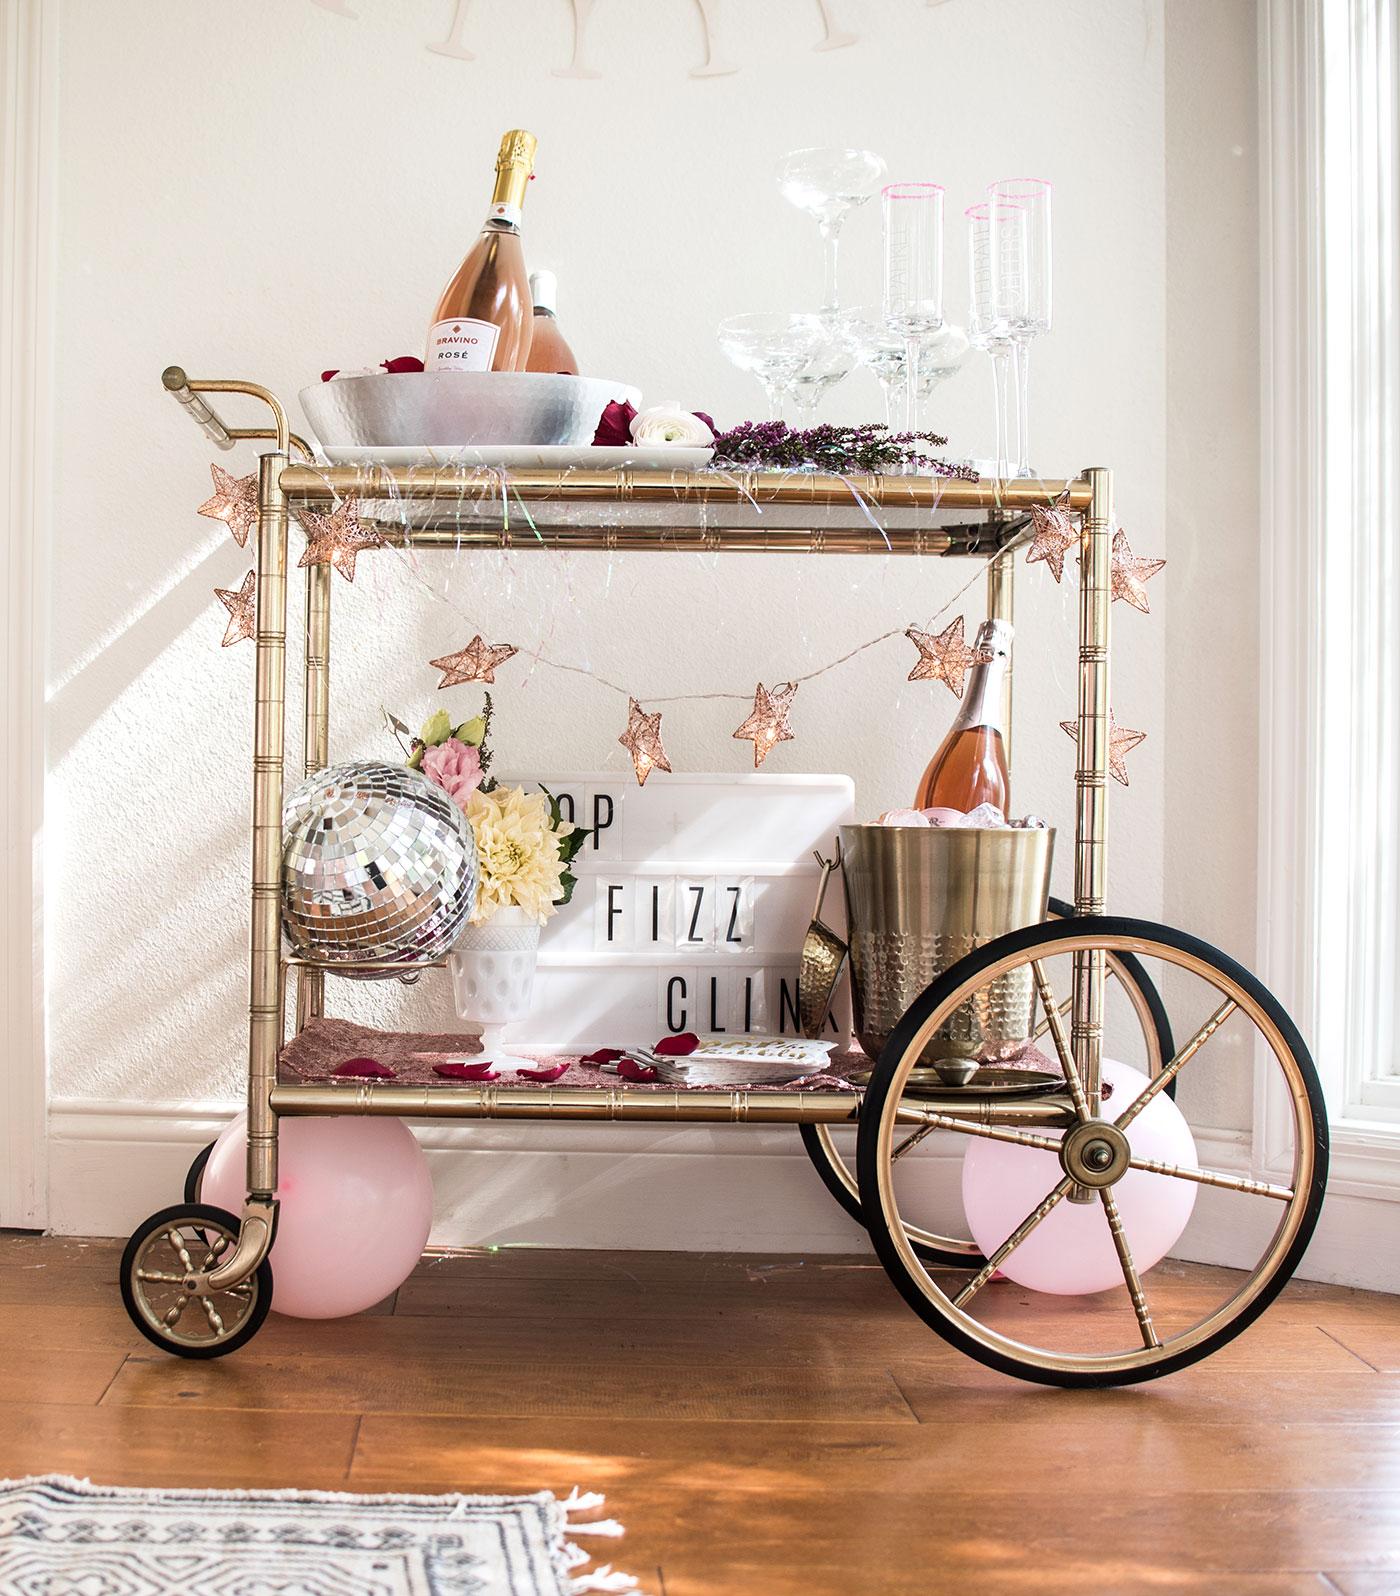 new-years-eve-bar-cart.jpg